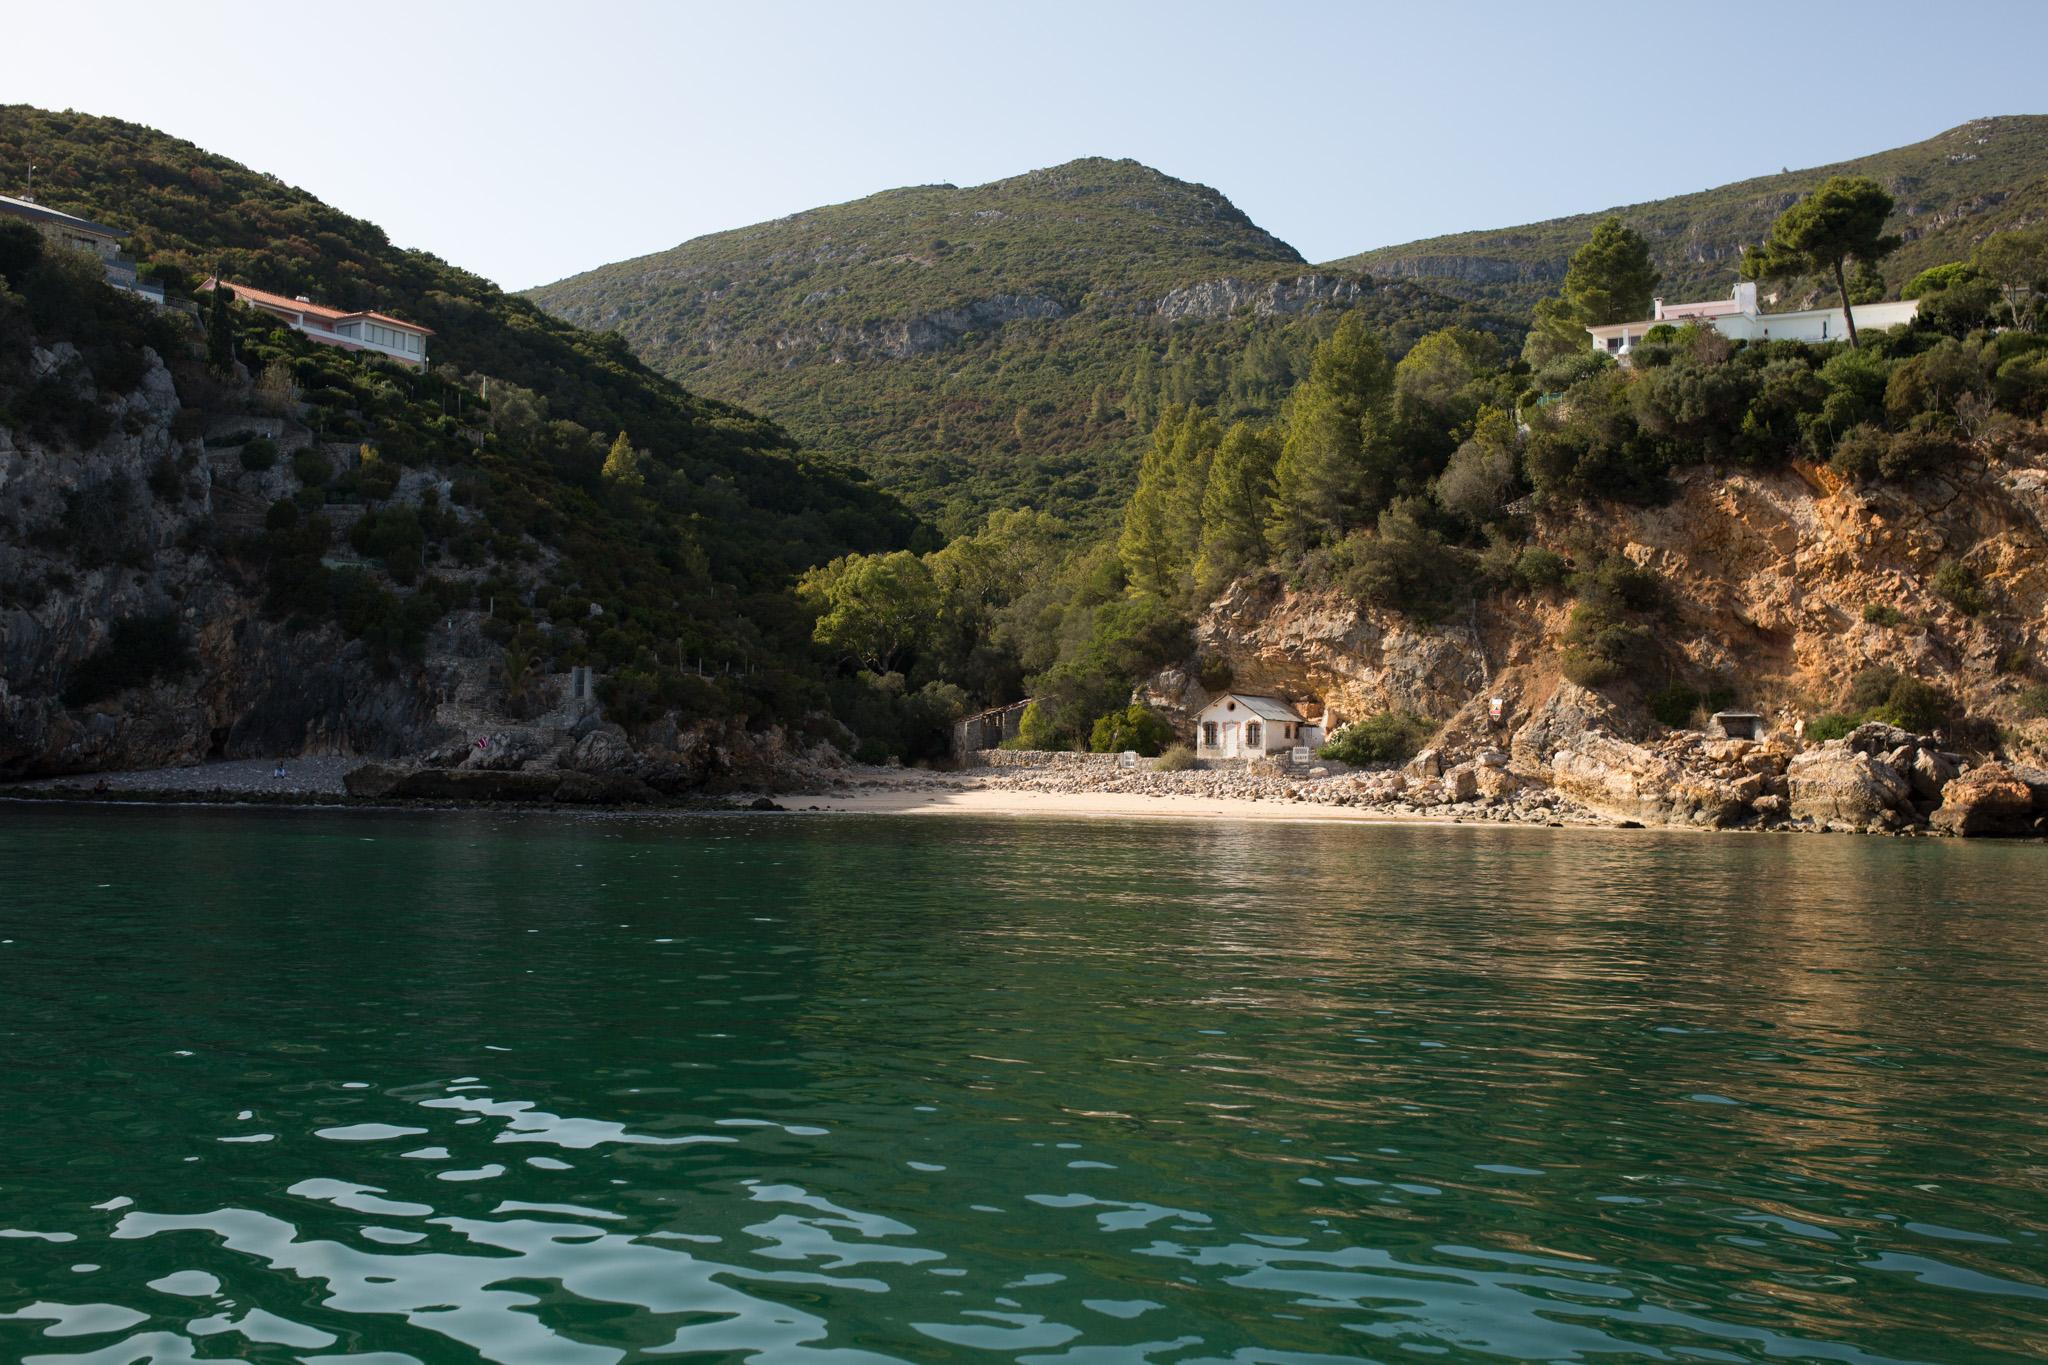 arrabida sea ventures-arrabida boat tour-sesimbra boat tour-setubal boat tour-lisbon boat tours-portugal beaches-alina mendoza-0836.jpg